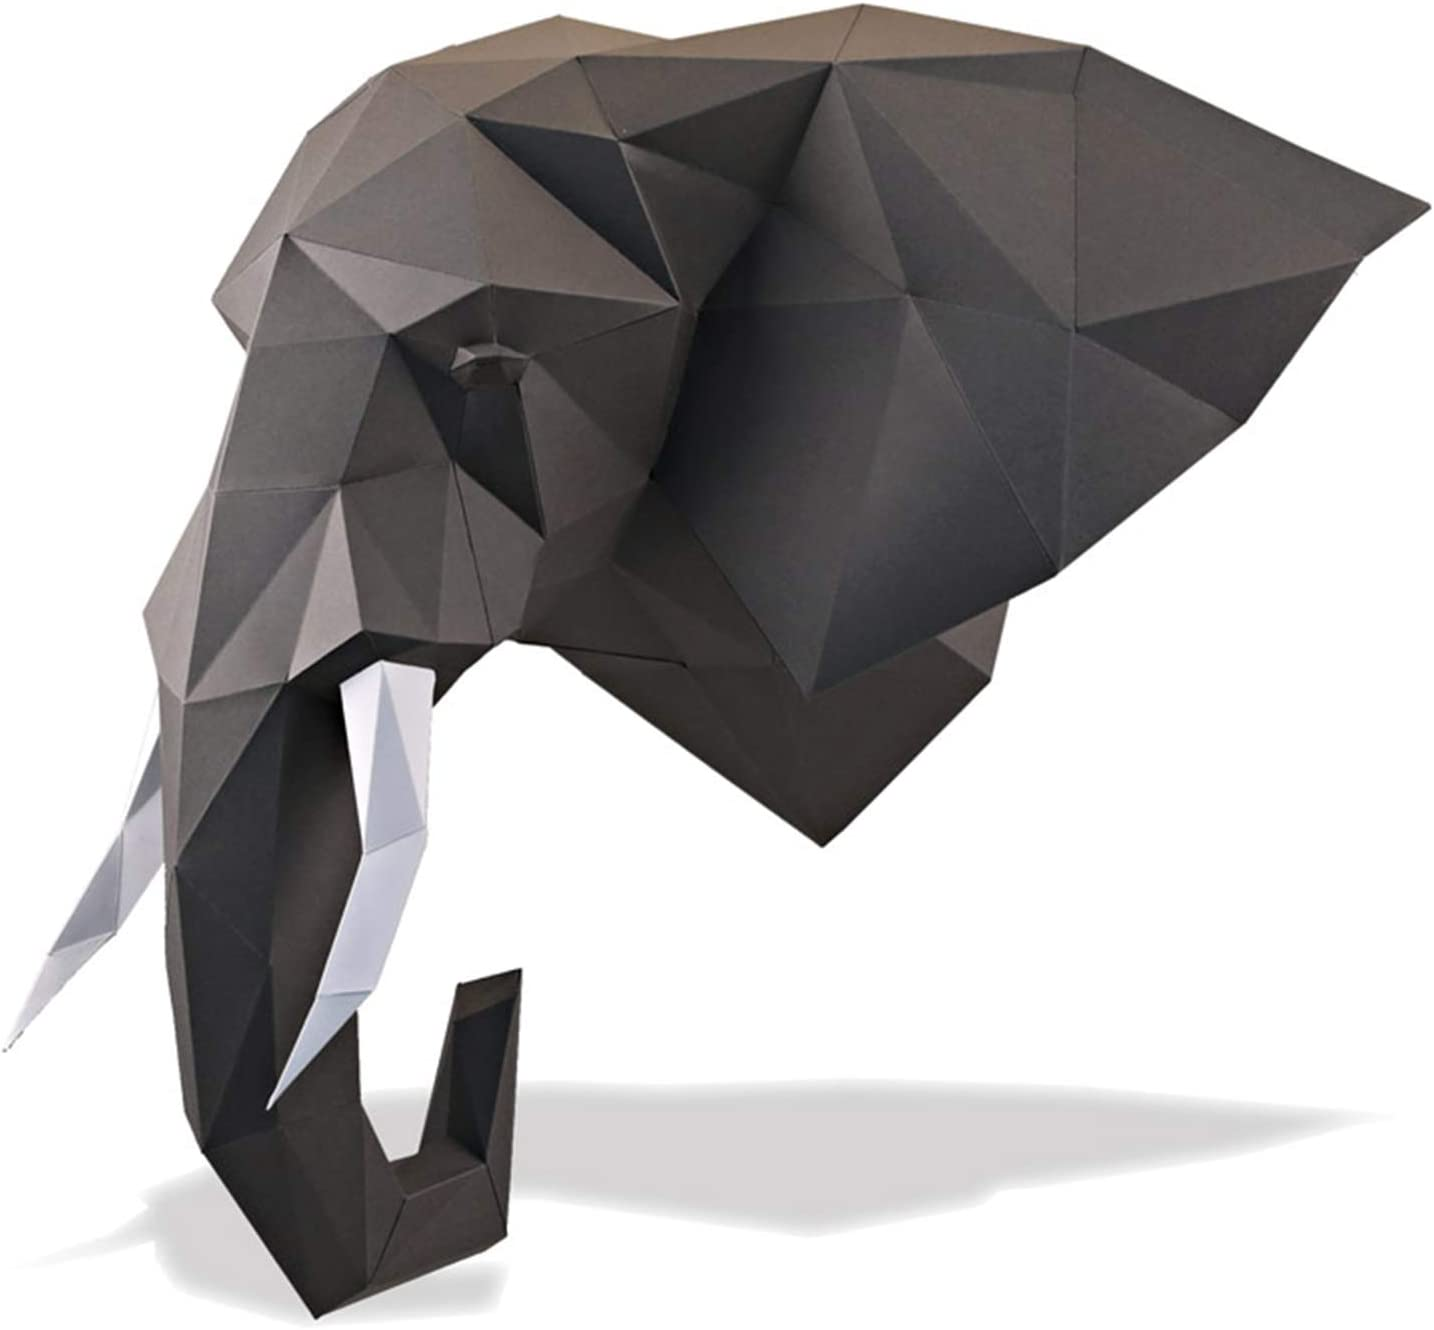 Paperraz DIY 3D Elephant Head Animal PaperCraft Building Kit Wall Mount - NO Scissors Needed